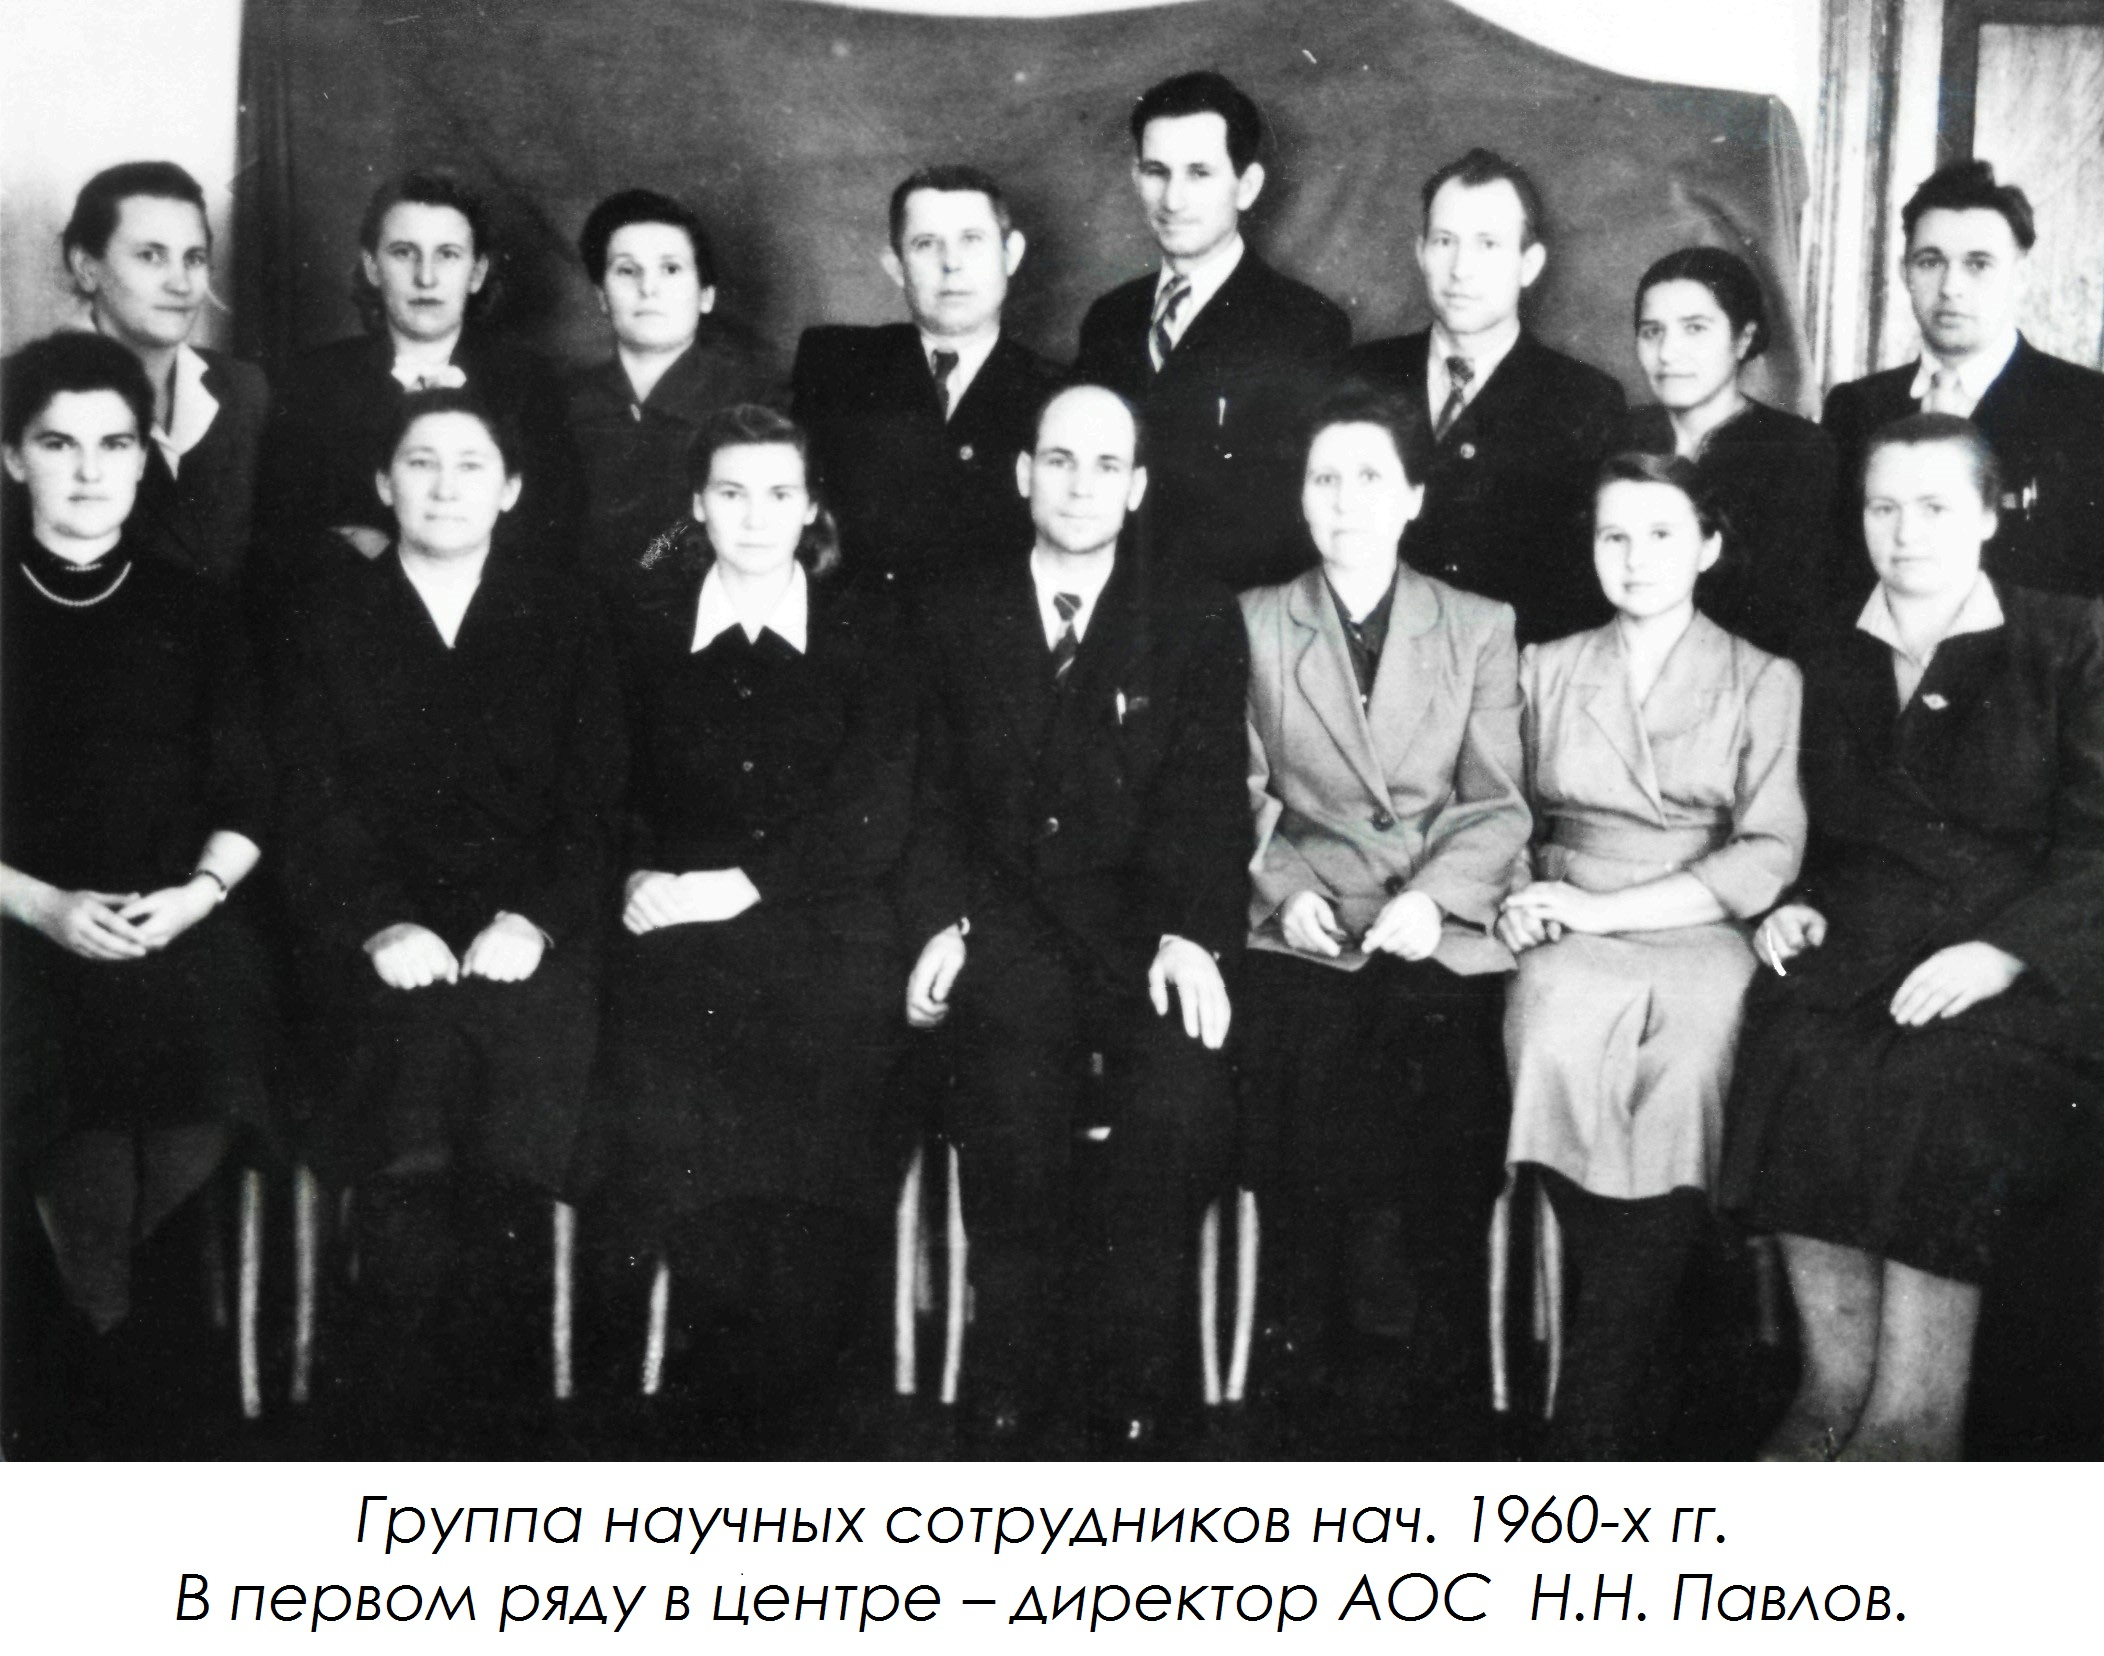 Группа научных сотрудников нач. 1960-х гг.1